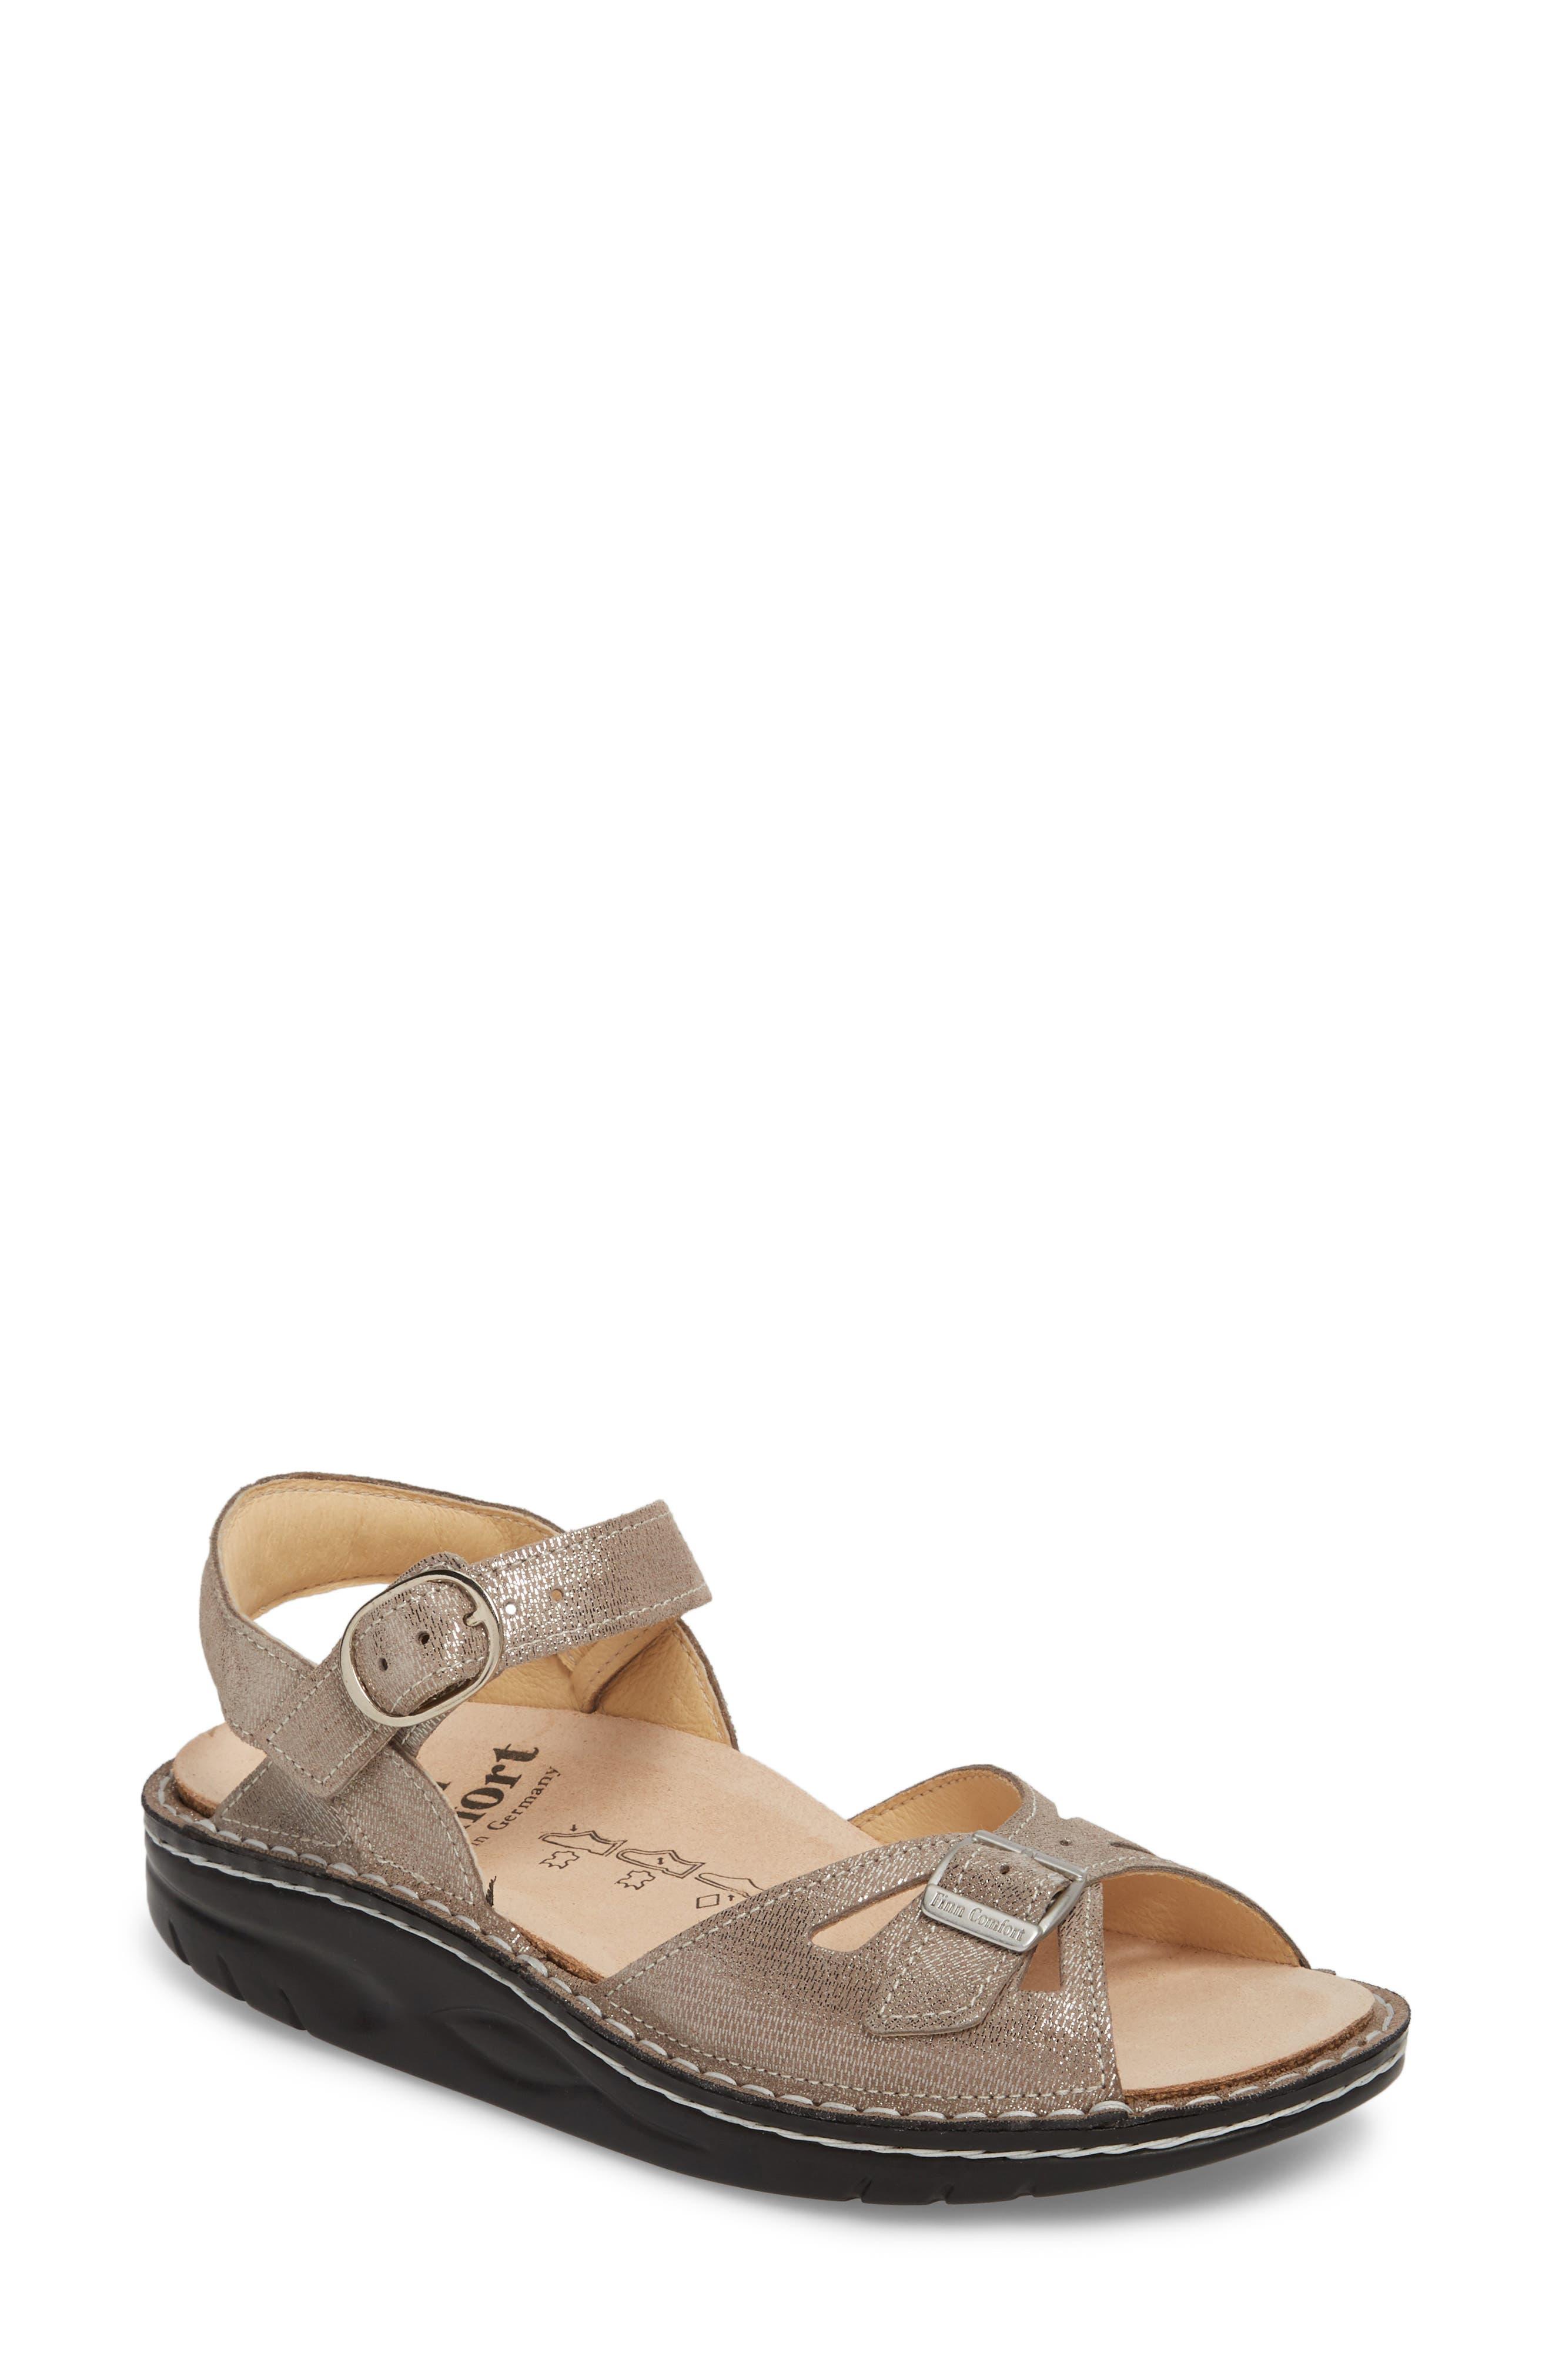 Motomachi Sandal,                             Main thumbnail 1, color,                             Fango Leather